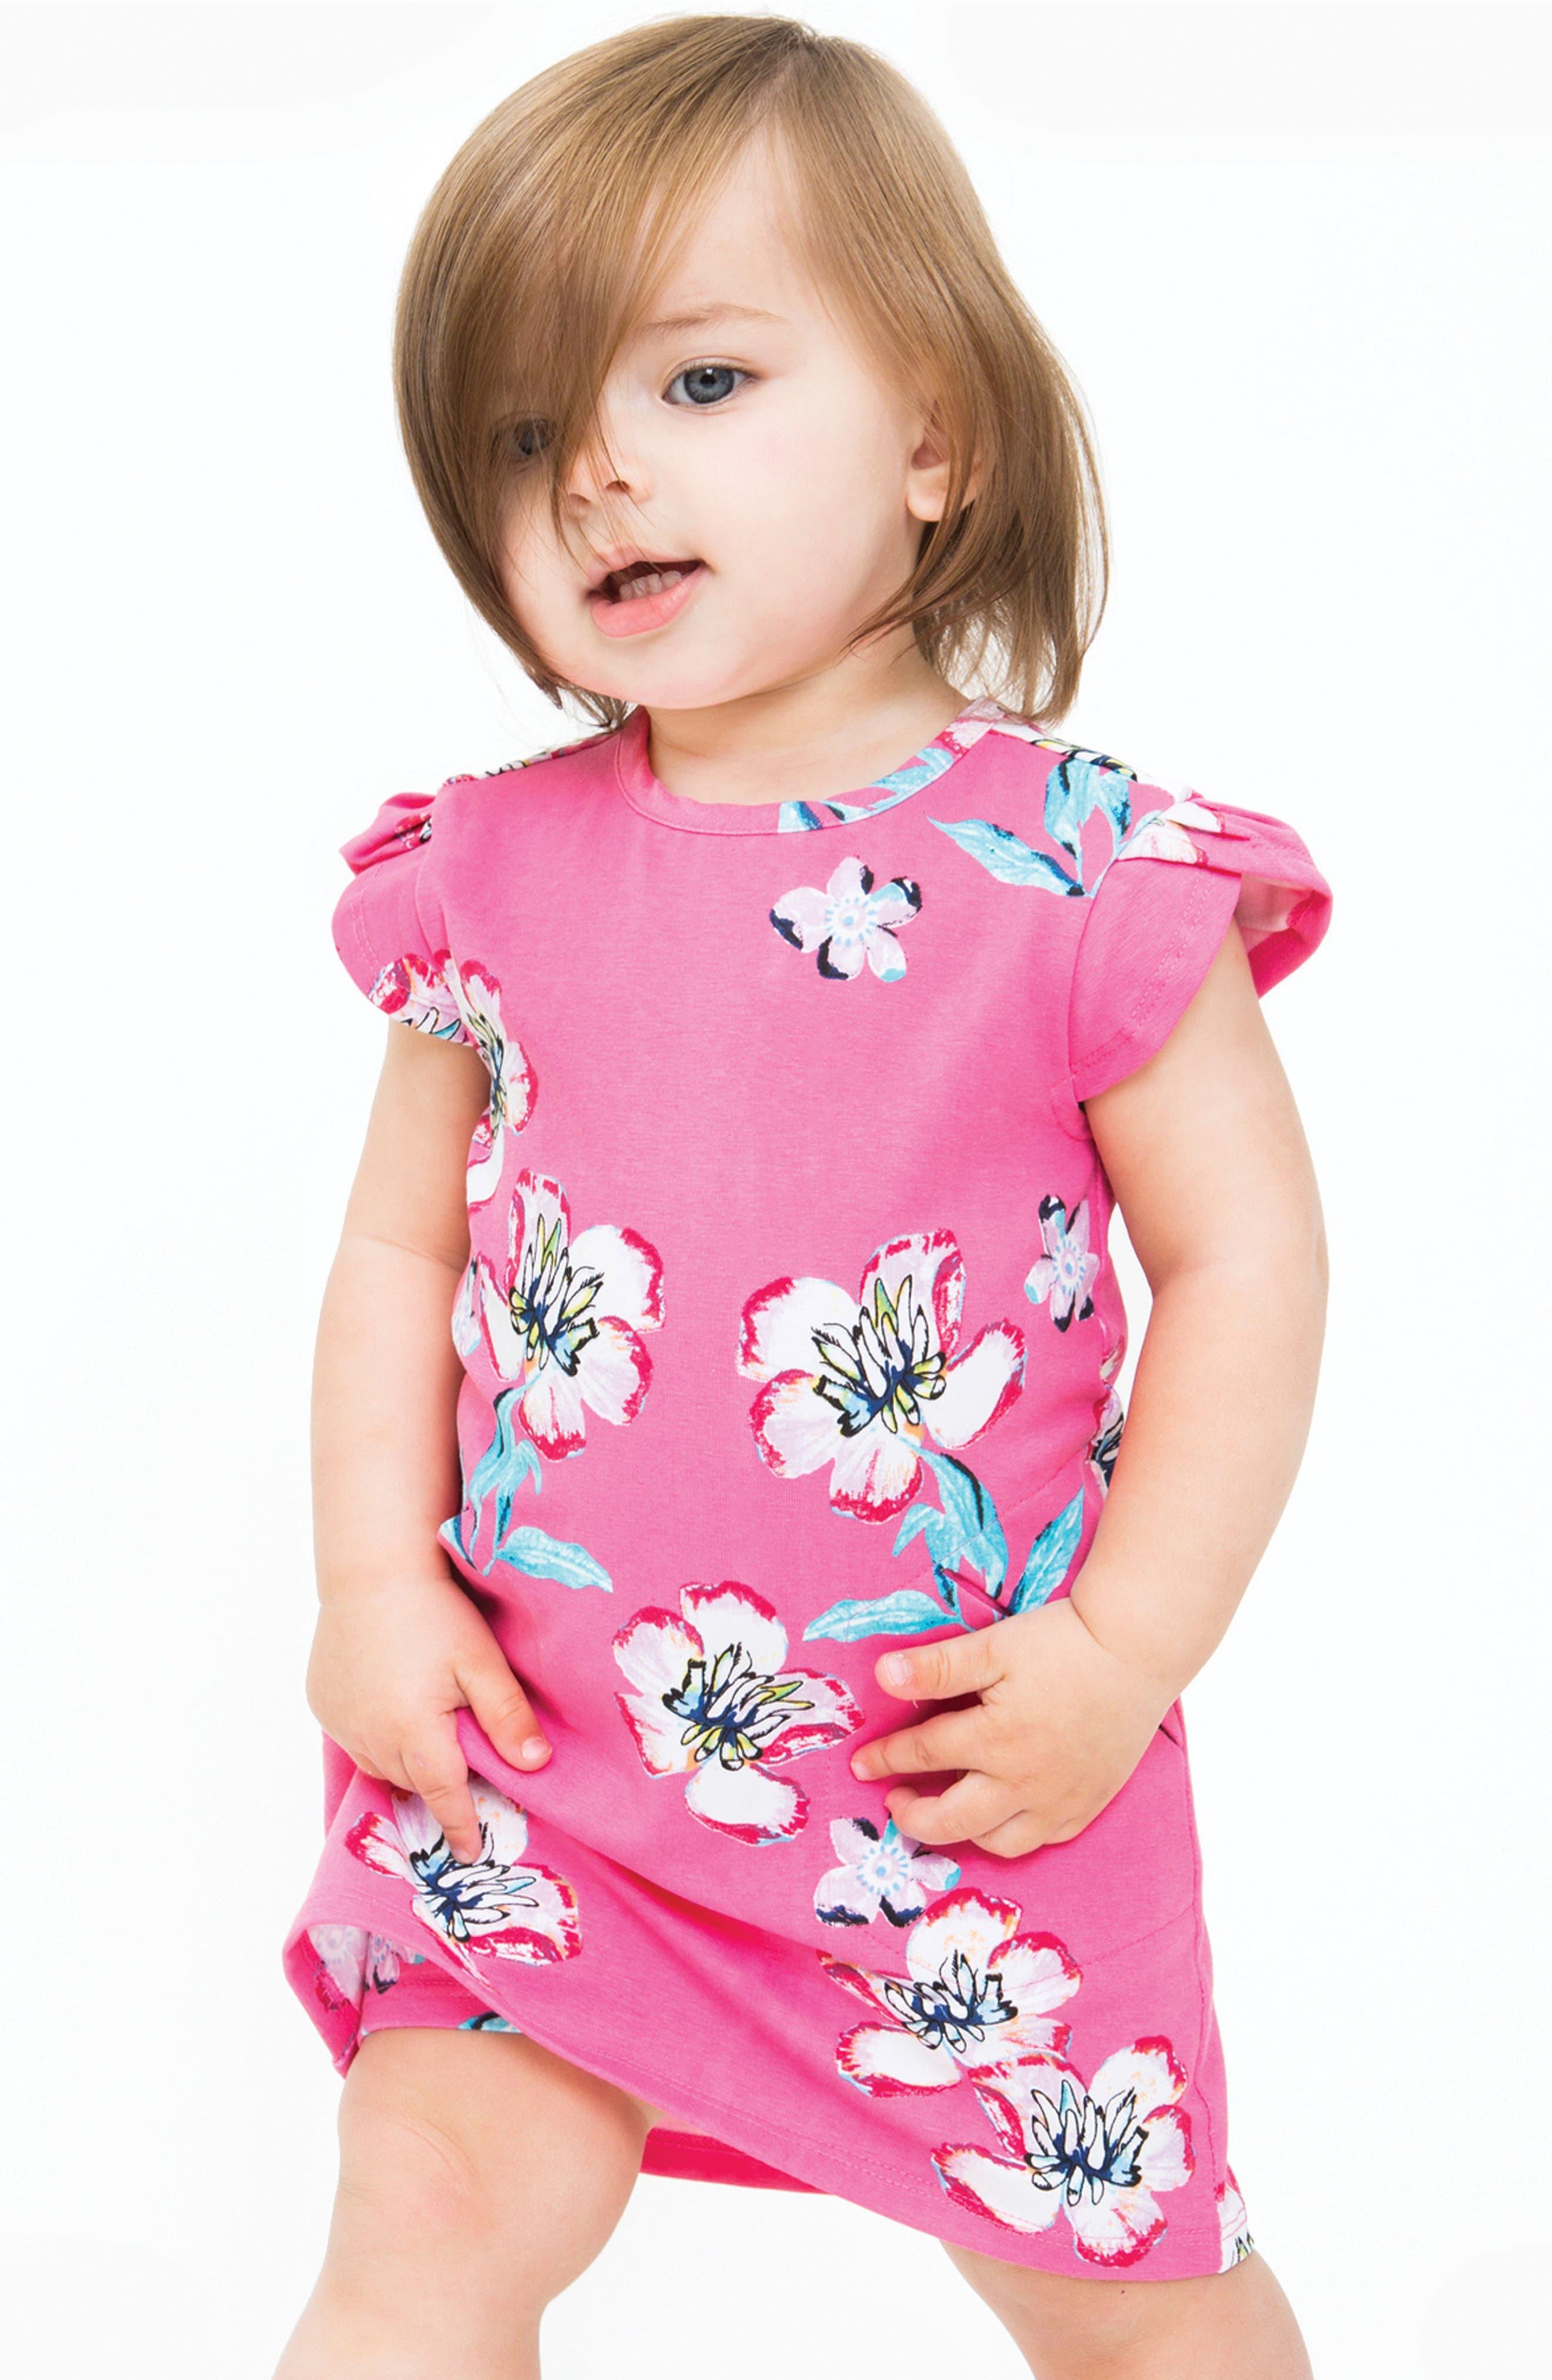 Ivy Plumeria Dress,                             Alternate thumbnail 2, color,                             Pink Plumeria